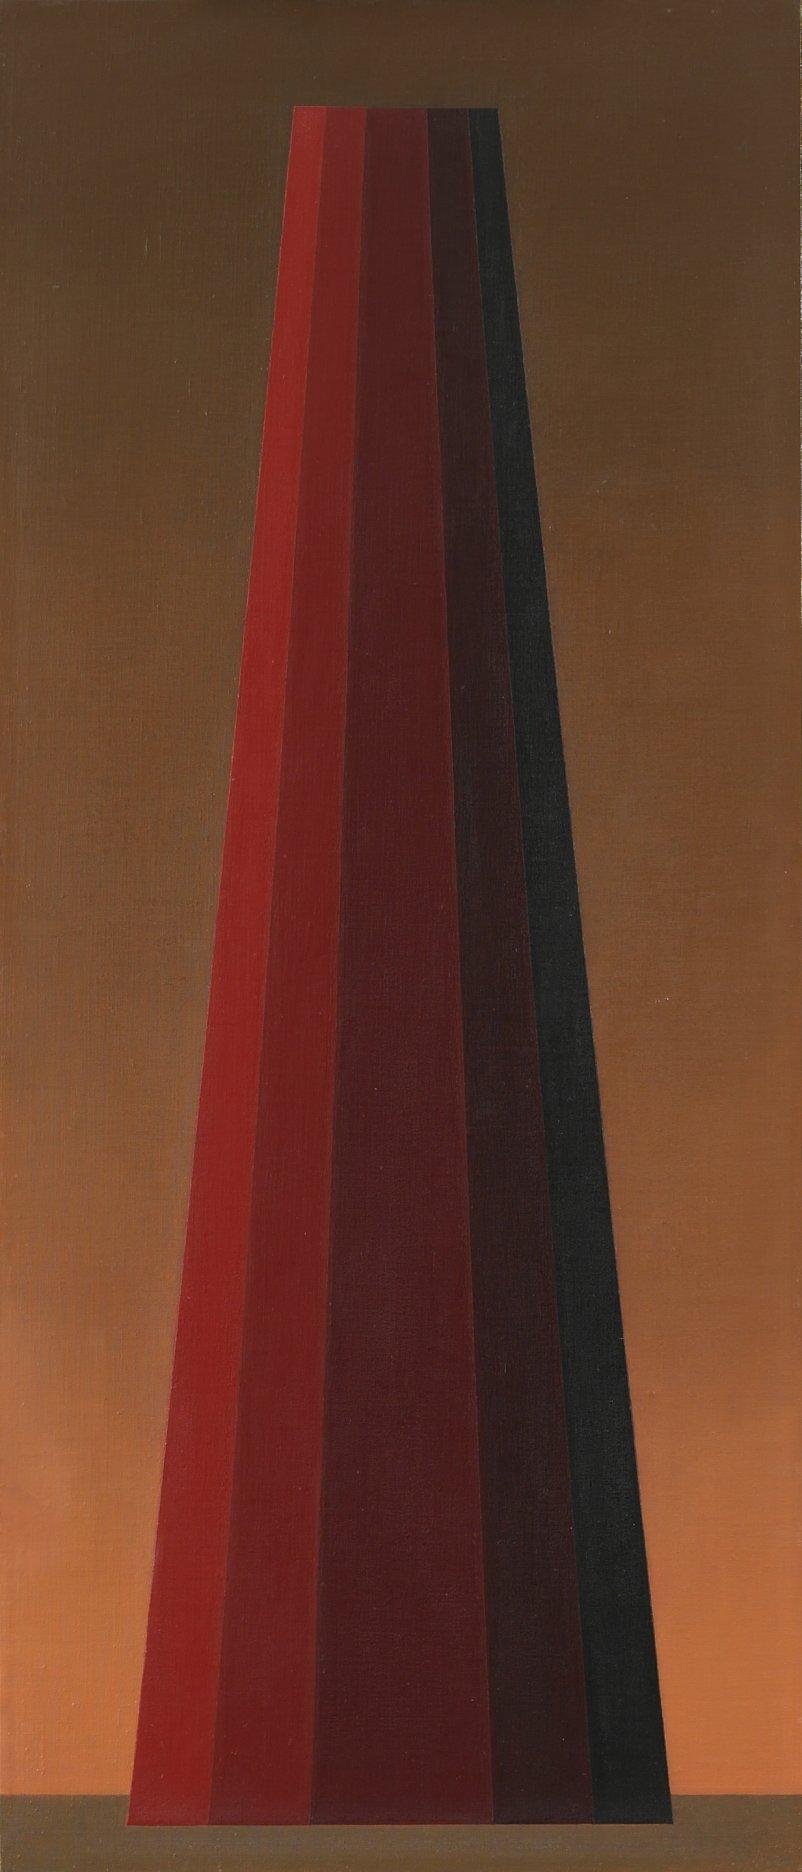 Pintura (1979) - Roberto Aizenberg